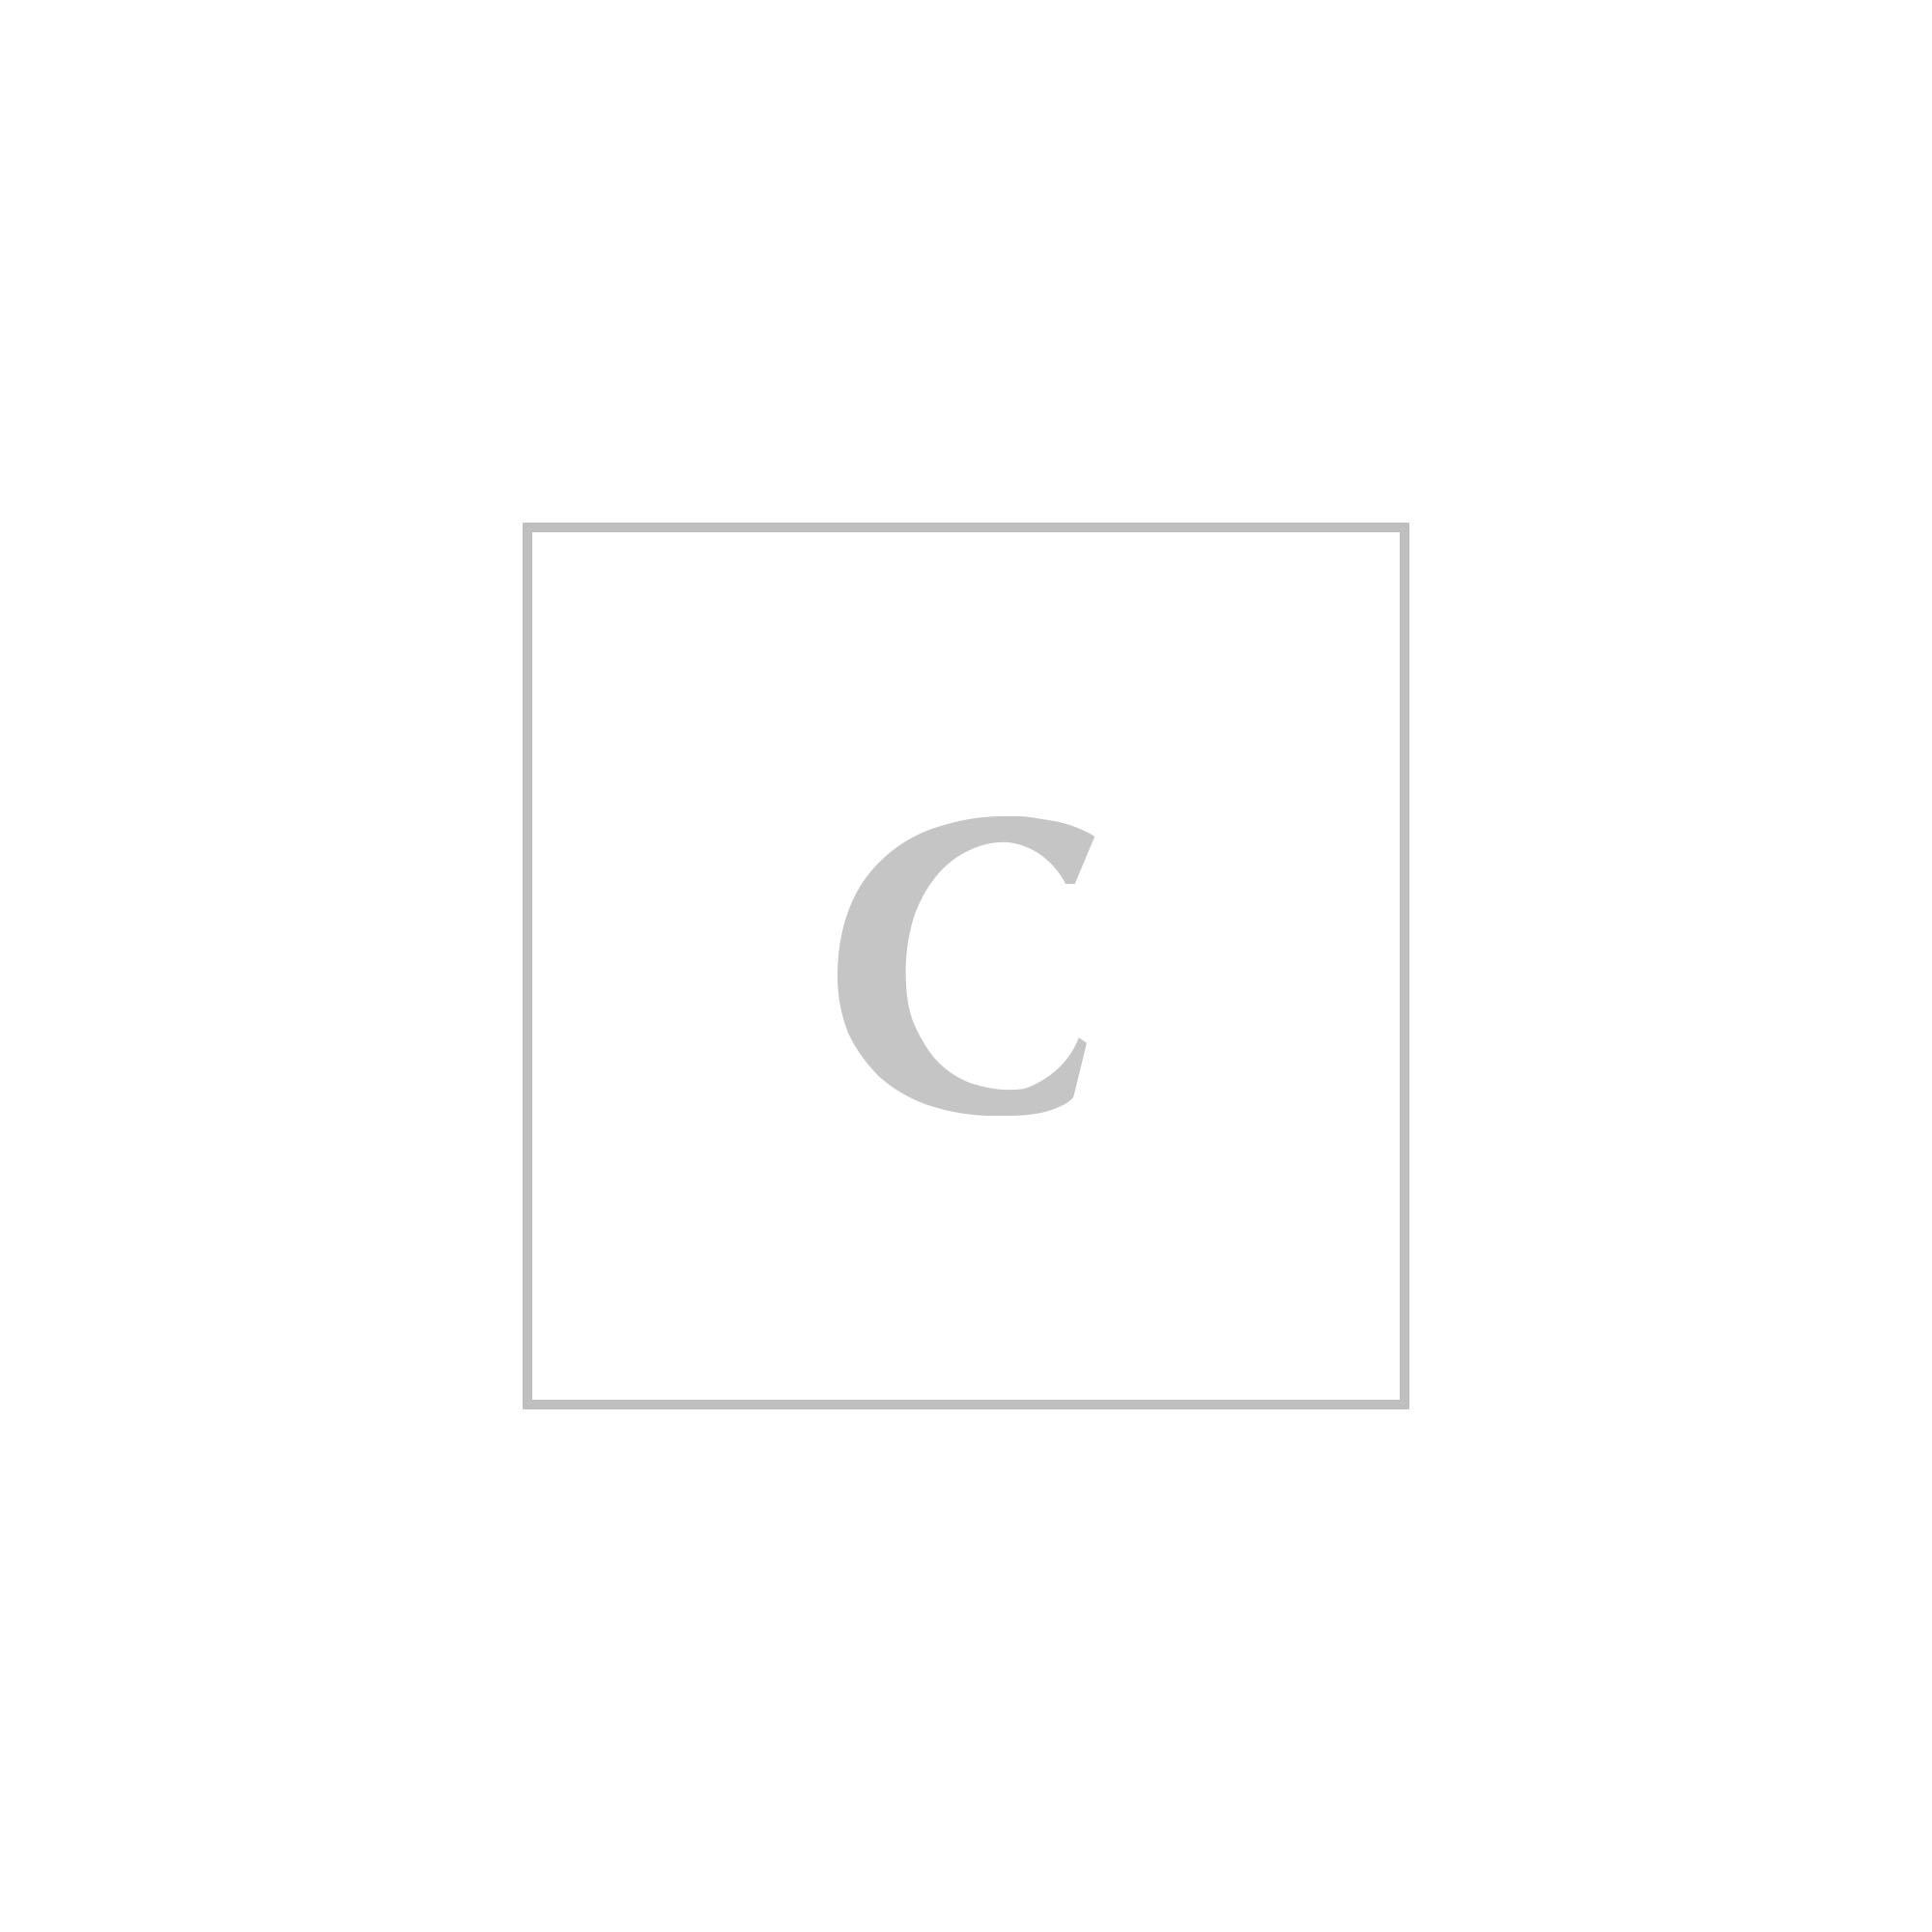 Dolce & gabbana sandalo keira stampa iguana vernice